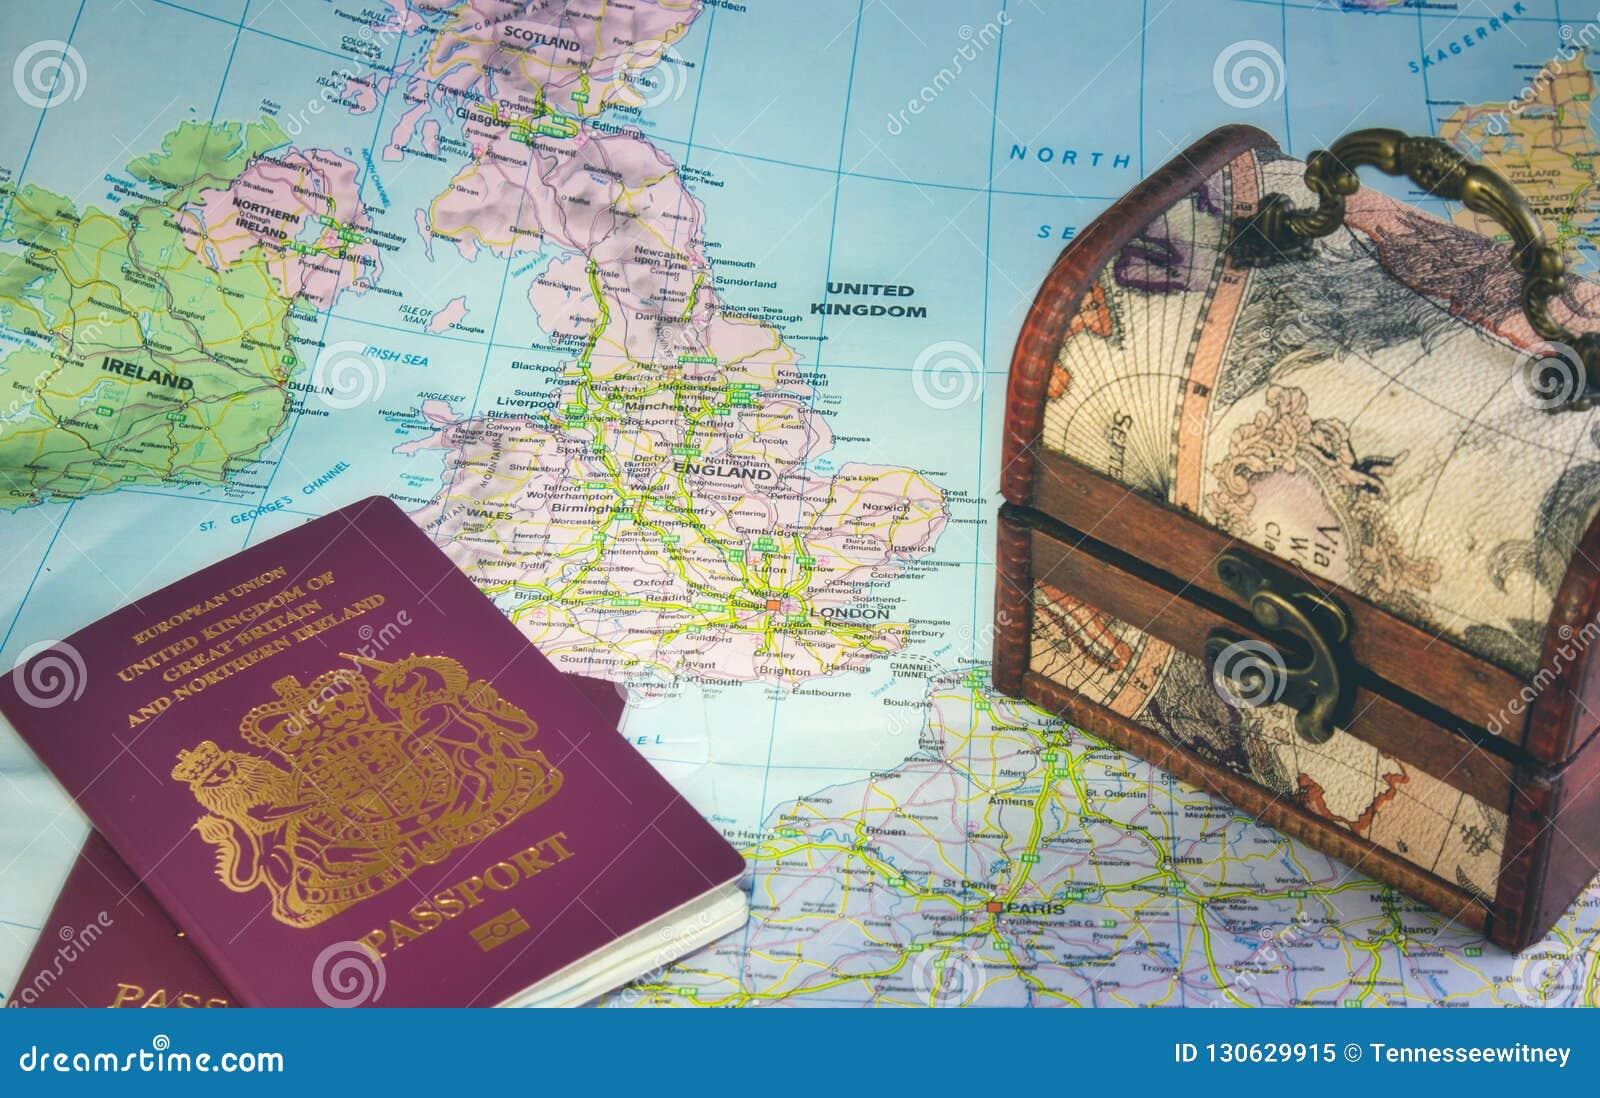 Map Of Europe And The Uk.Map Of Europe Showing The Uk England Ireland France British